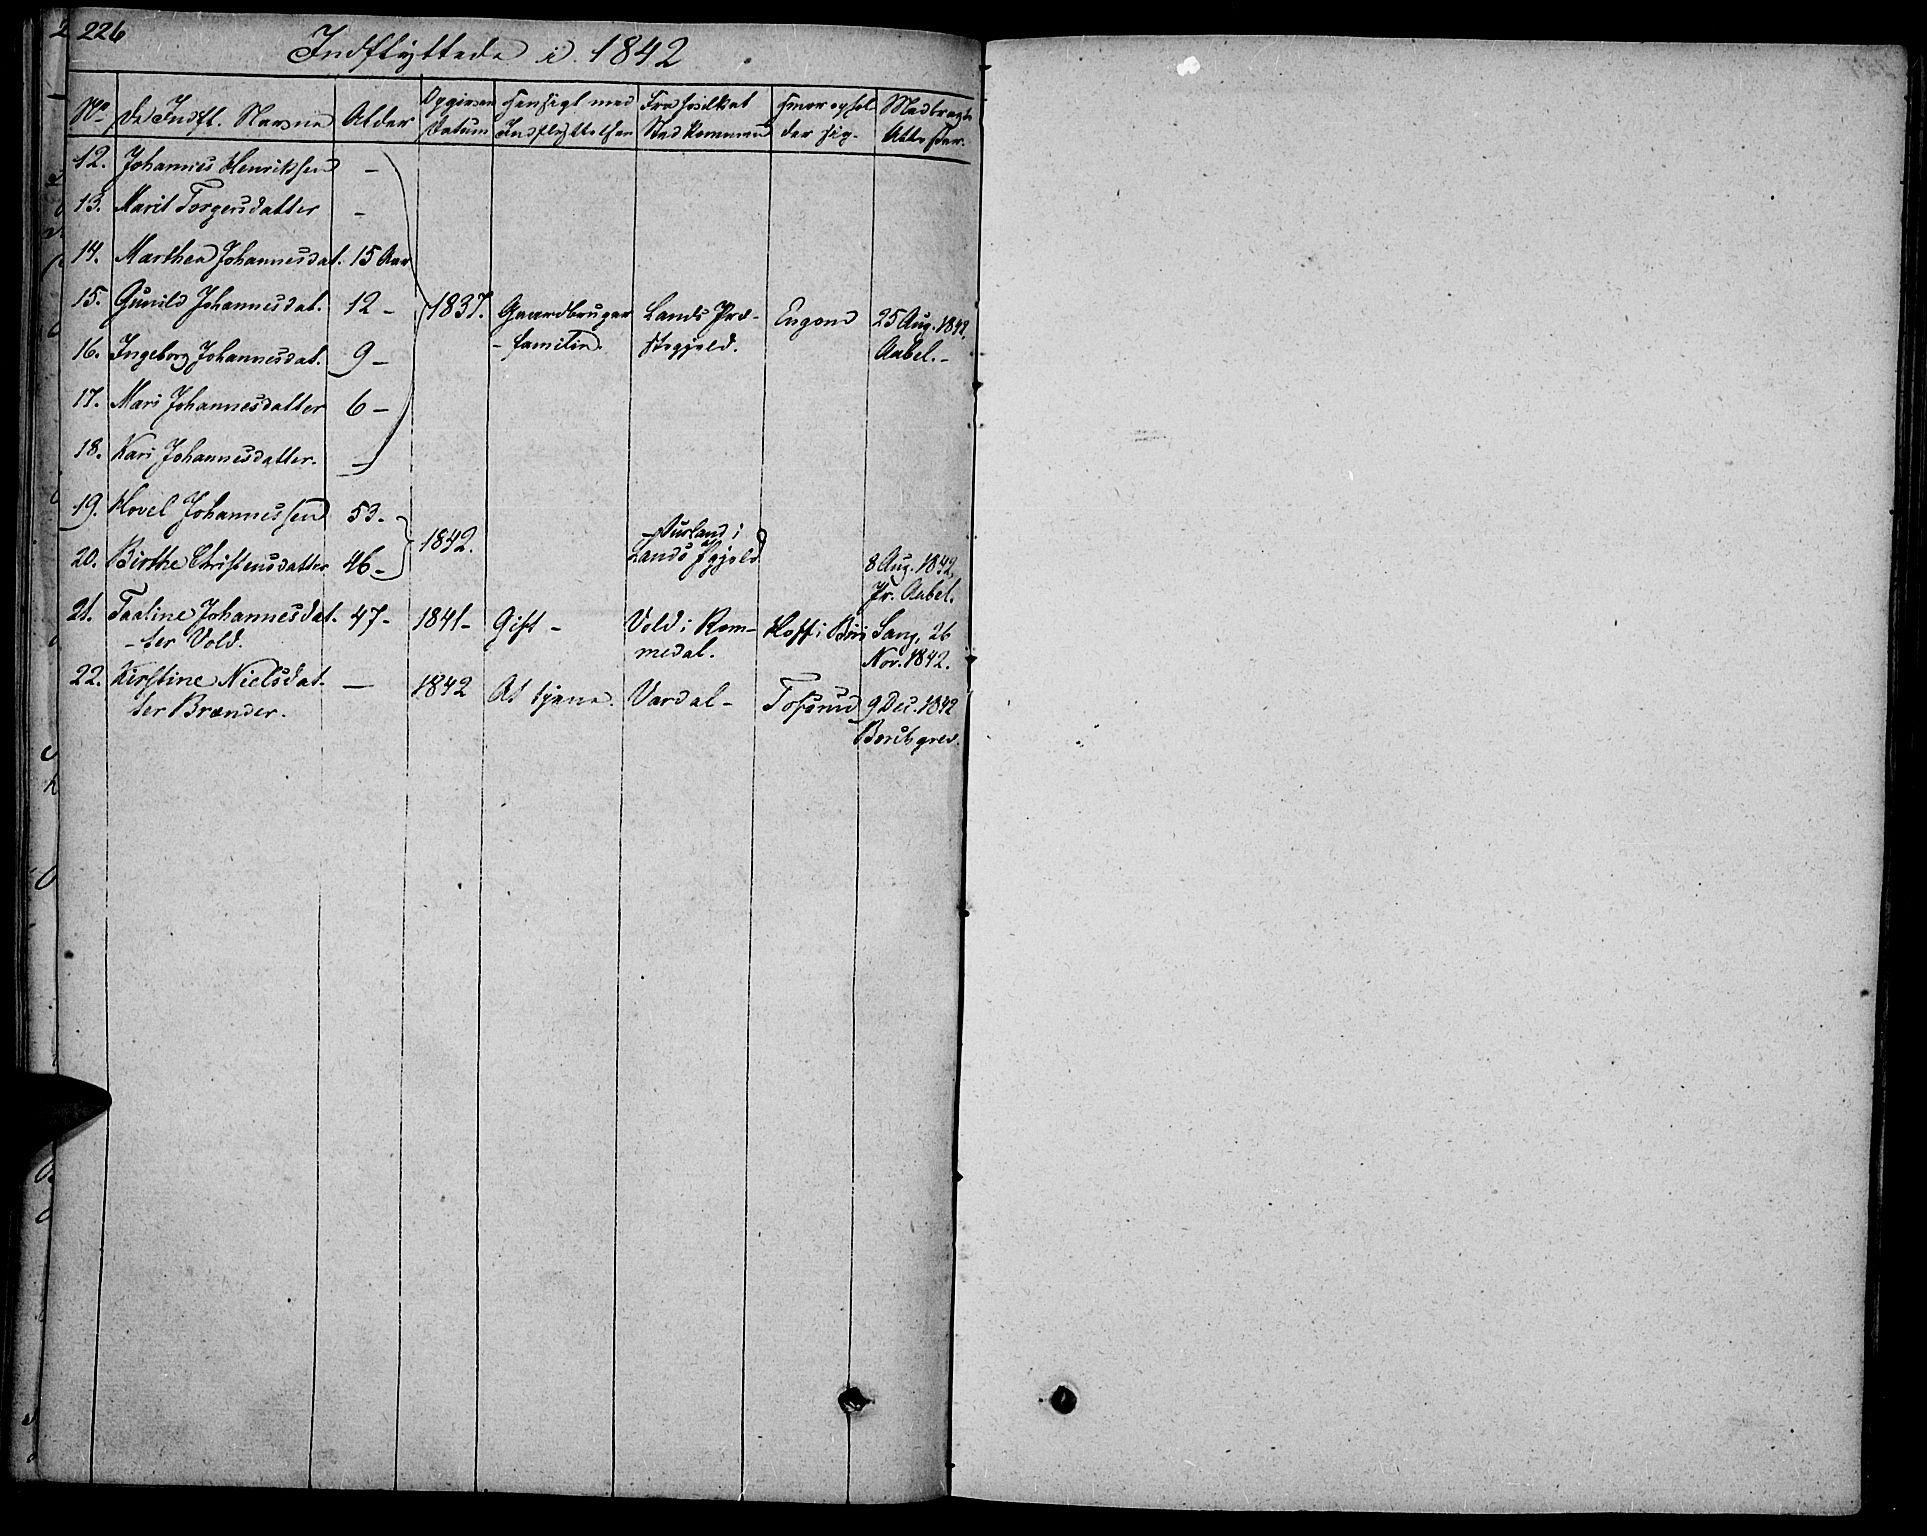 SAH, Biri prestekontor, Ministerialbok nr. 4, 1829-1842, s. 226